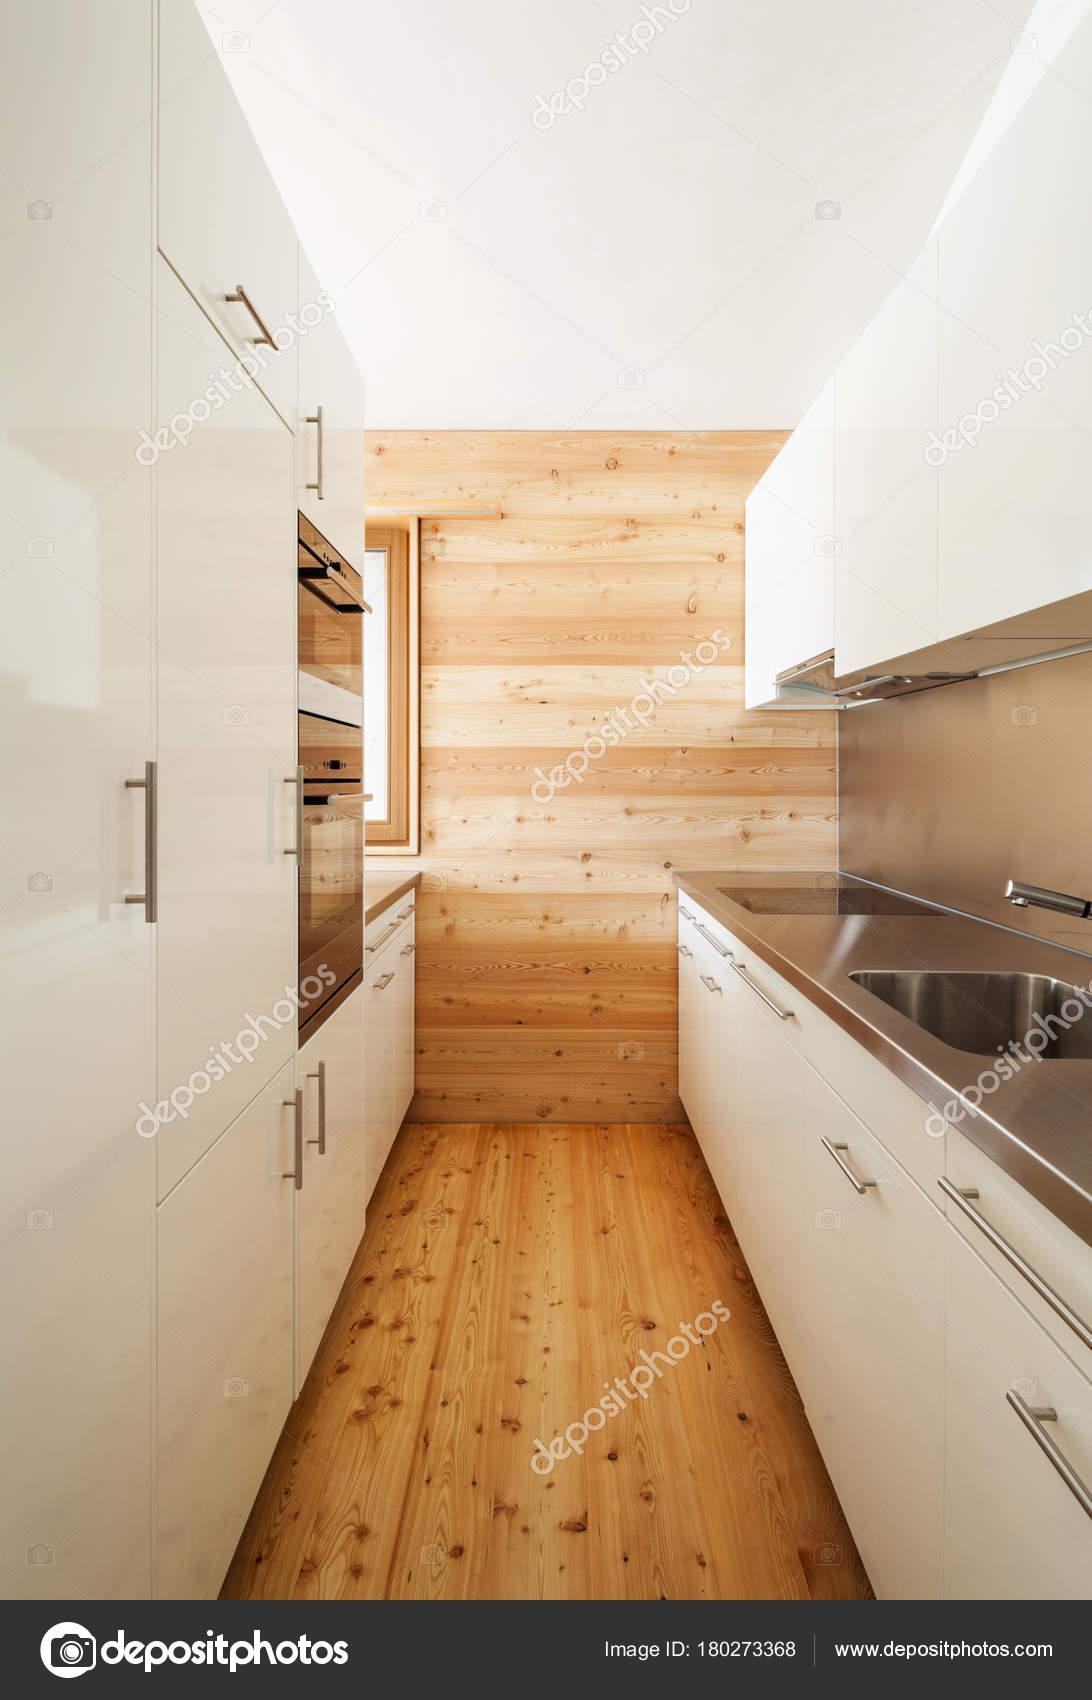 Architettura Design Moderno Casa Montagna Cucina — Foto ...